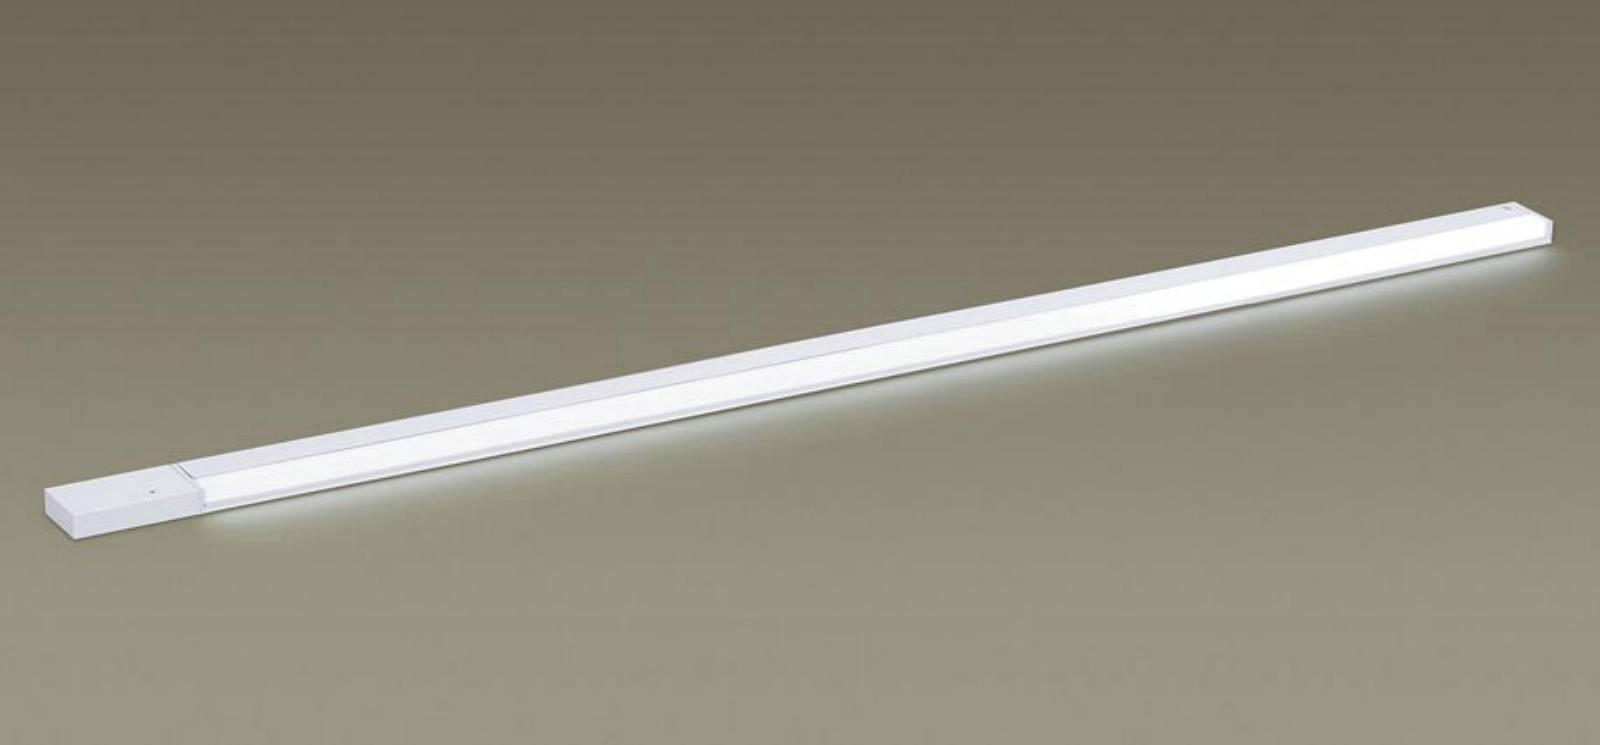 T区分 パナソニック LGB50836LE1 ベースライト 建築化照明器具 畳数設定無し LED【setsuden_led】